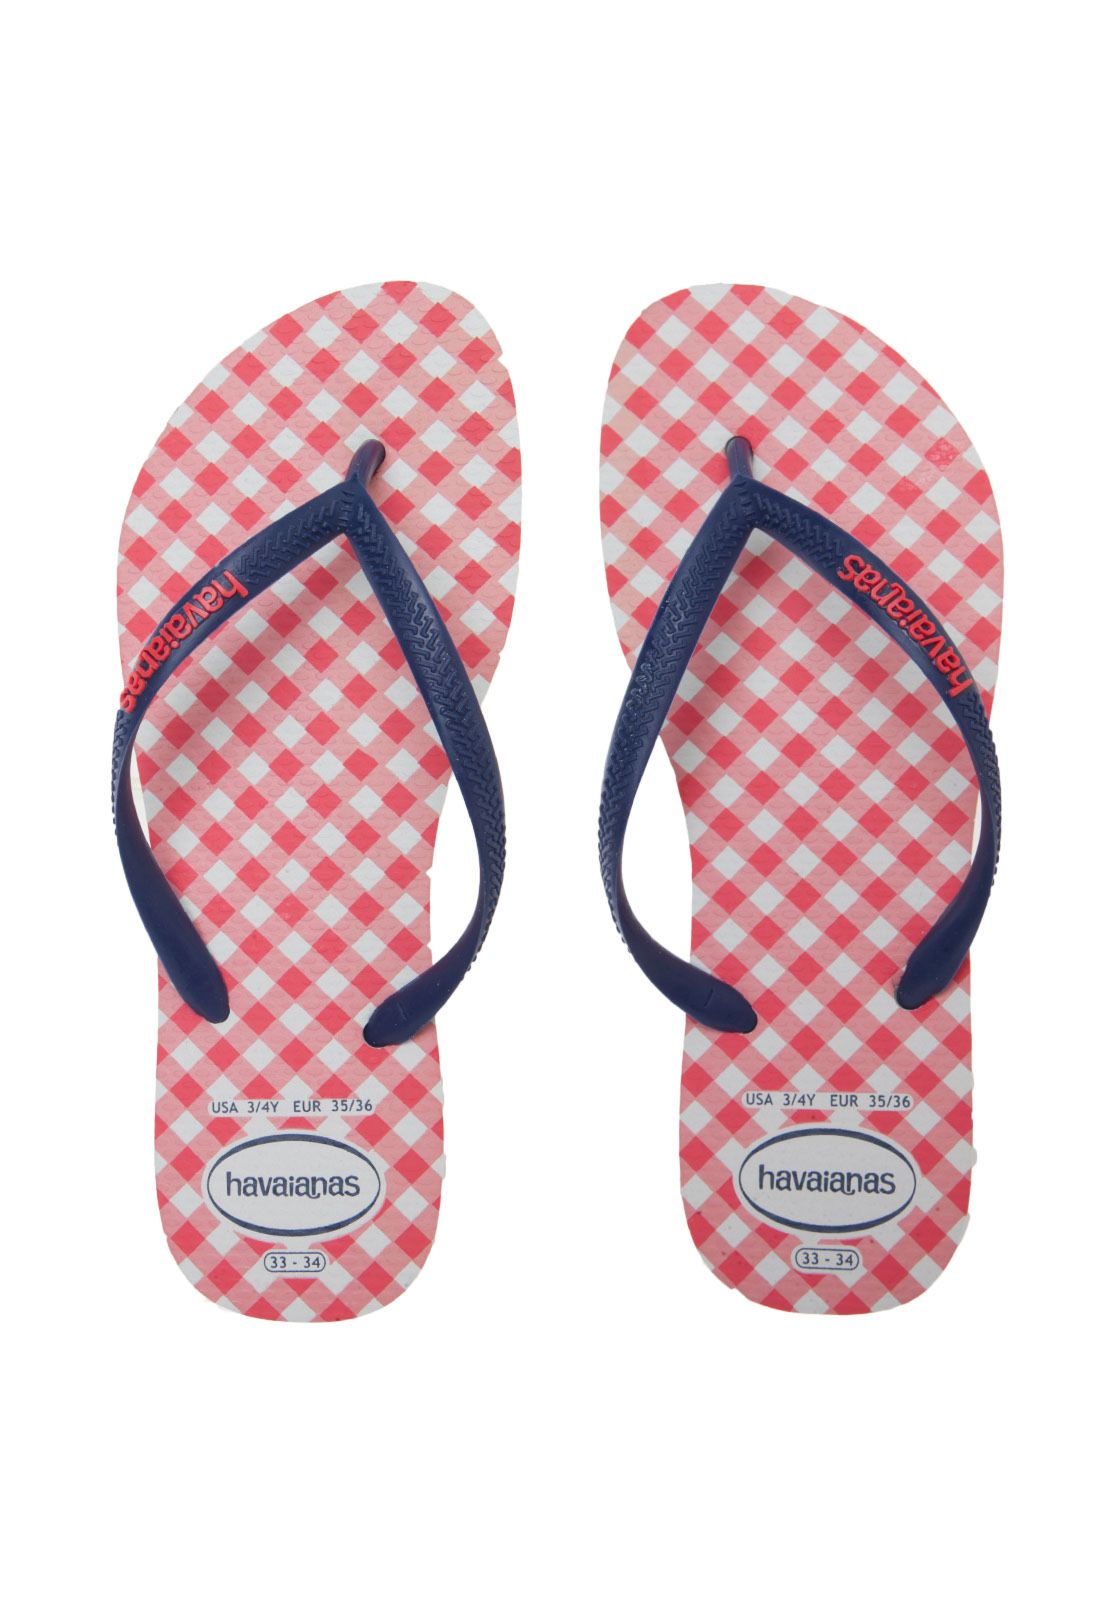 9311e9875 Sandália Havaianas Slim Retrô Branca   Flip Flops   Havaianas slim ...